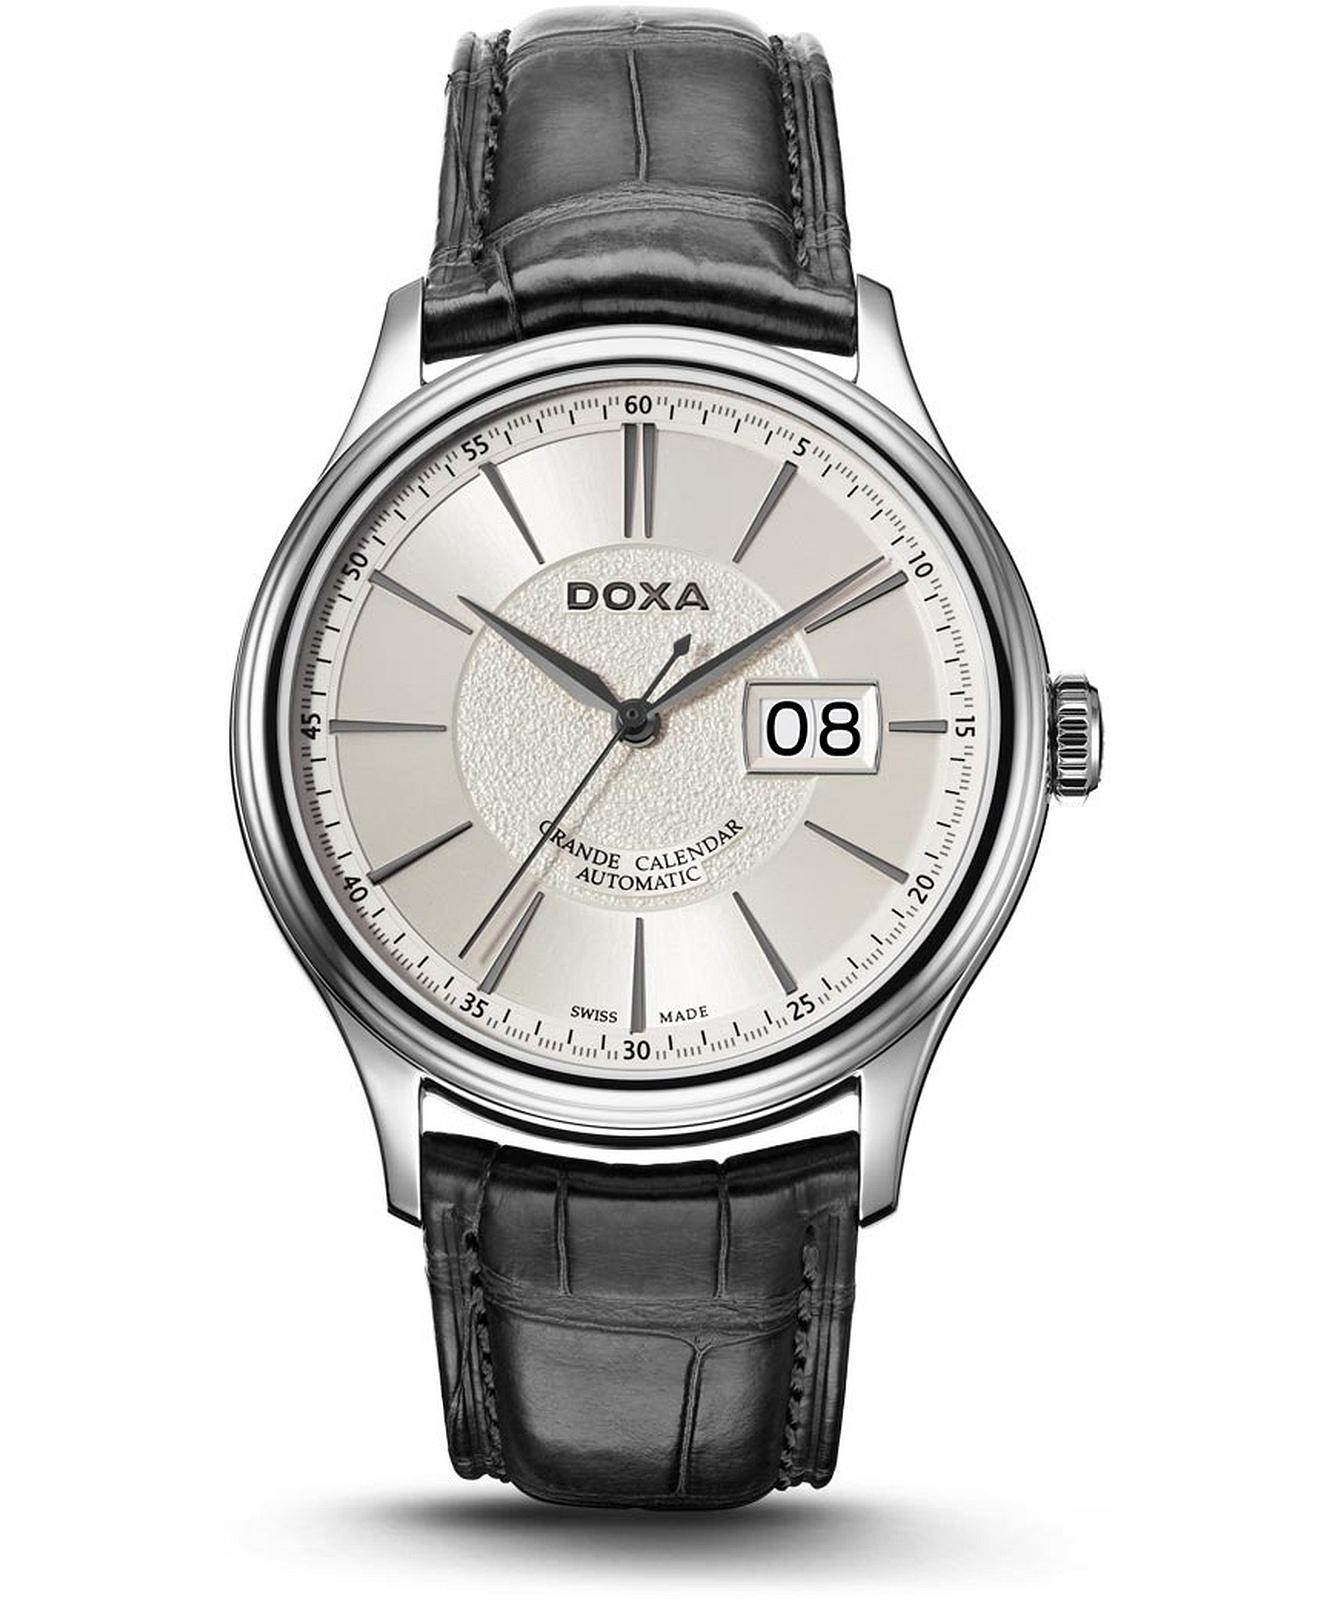 zegarek-meski-doxa-grande-calendar-automatic-limited-edition-d187siy_001